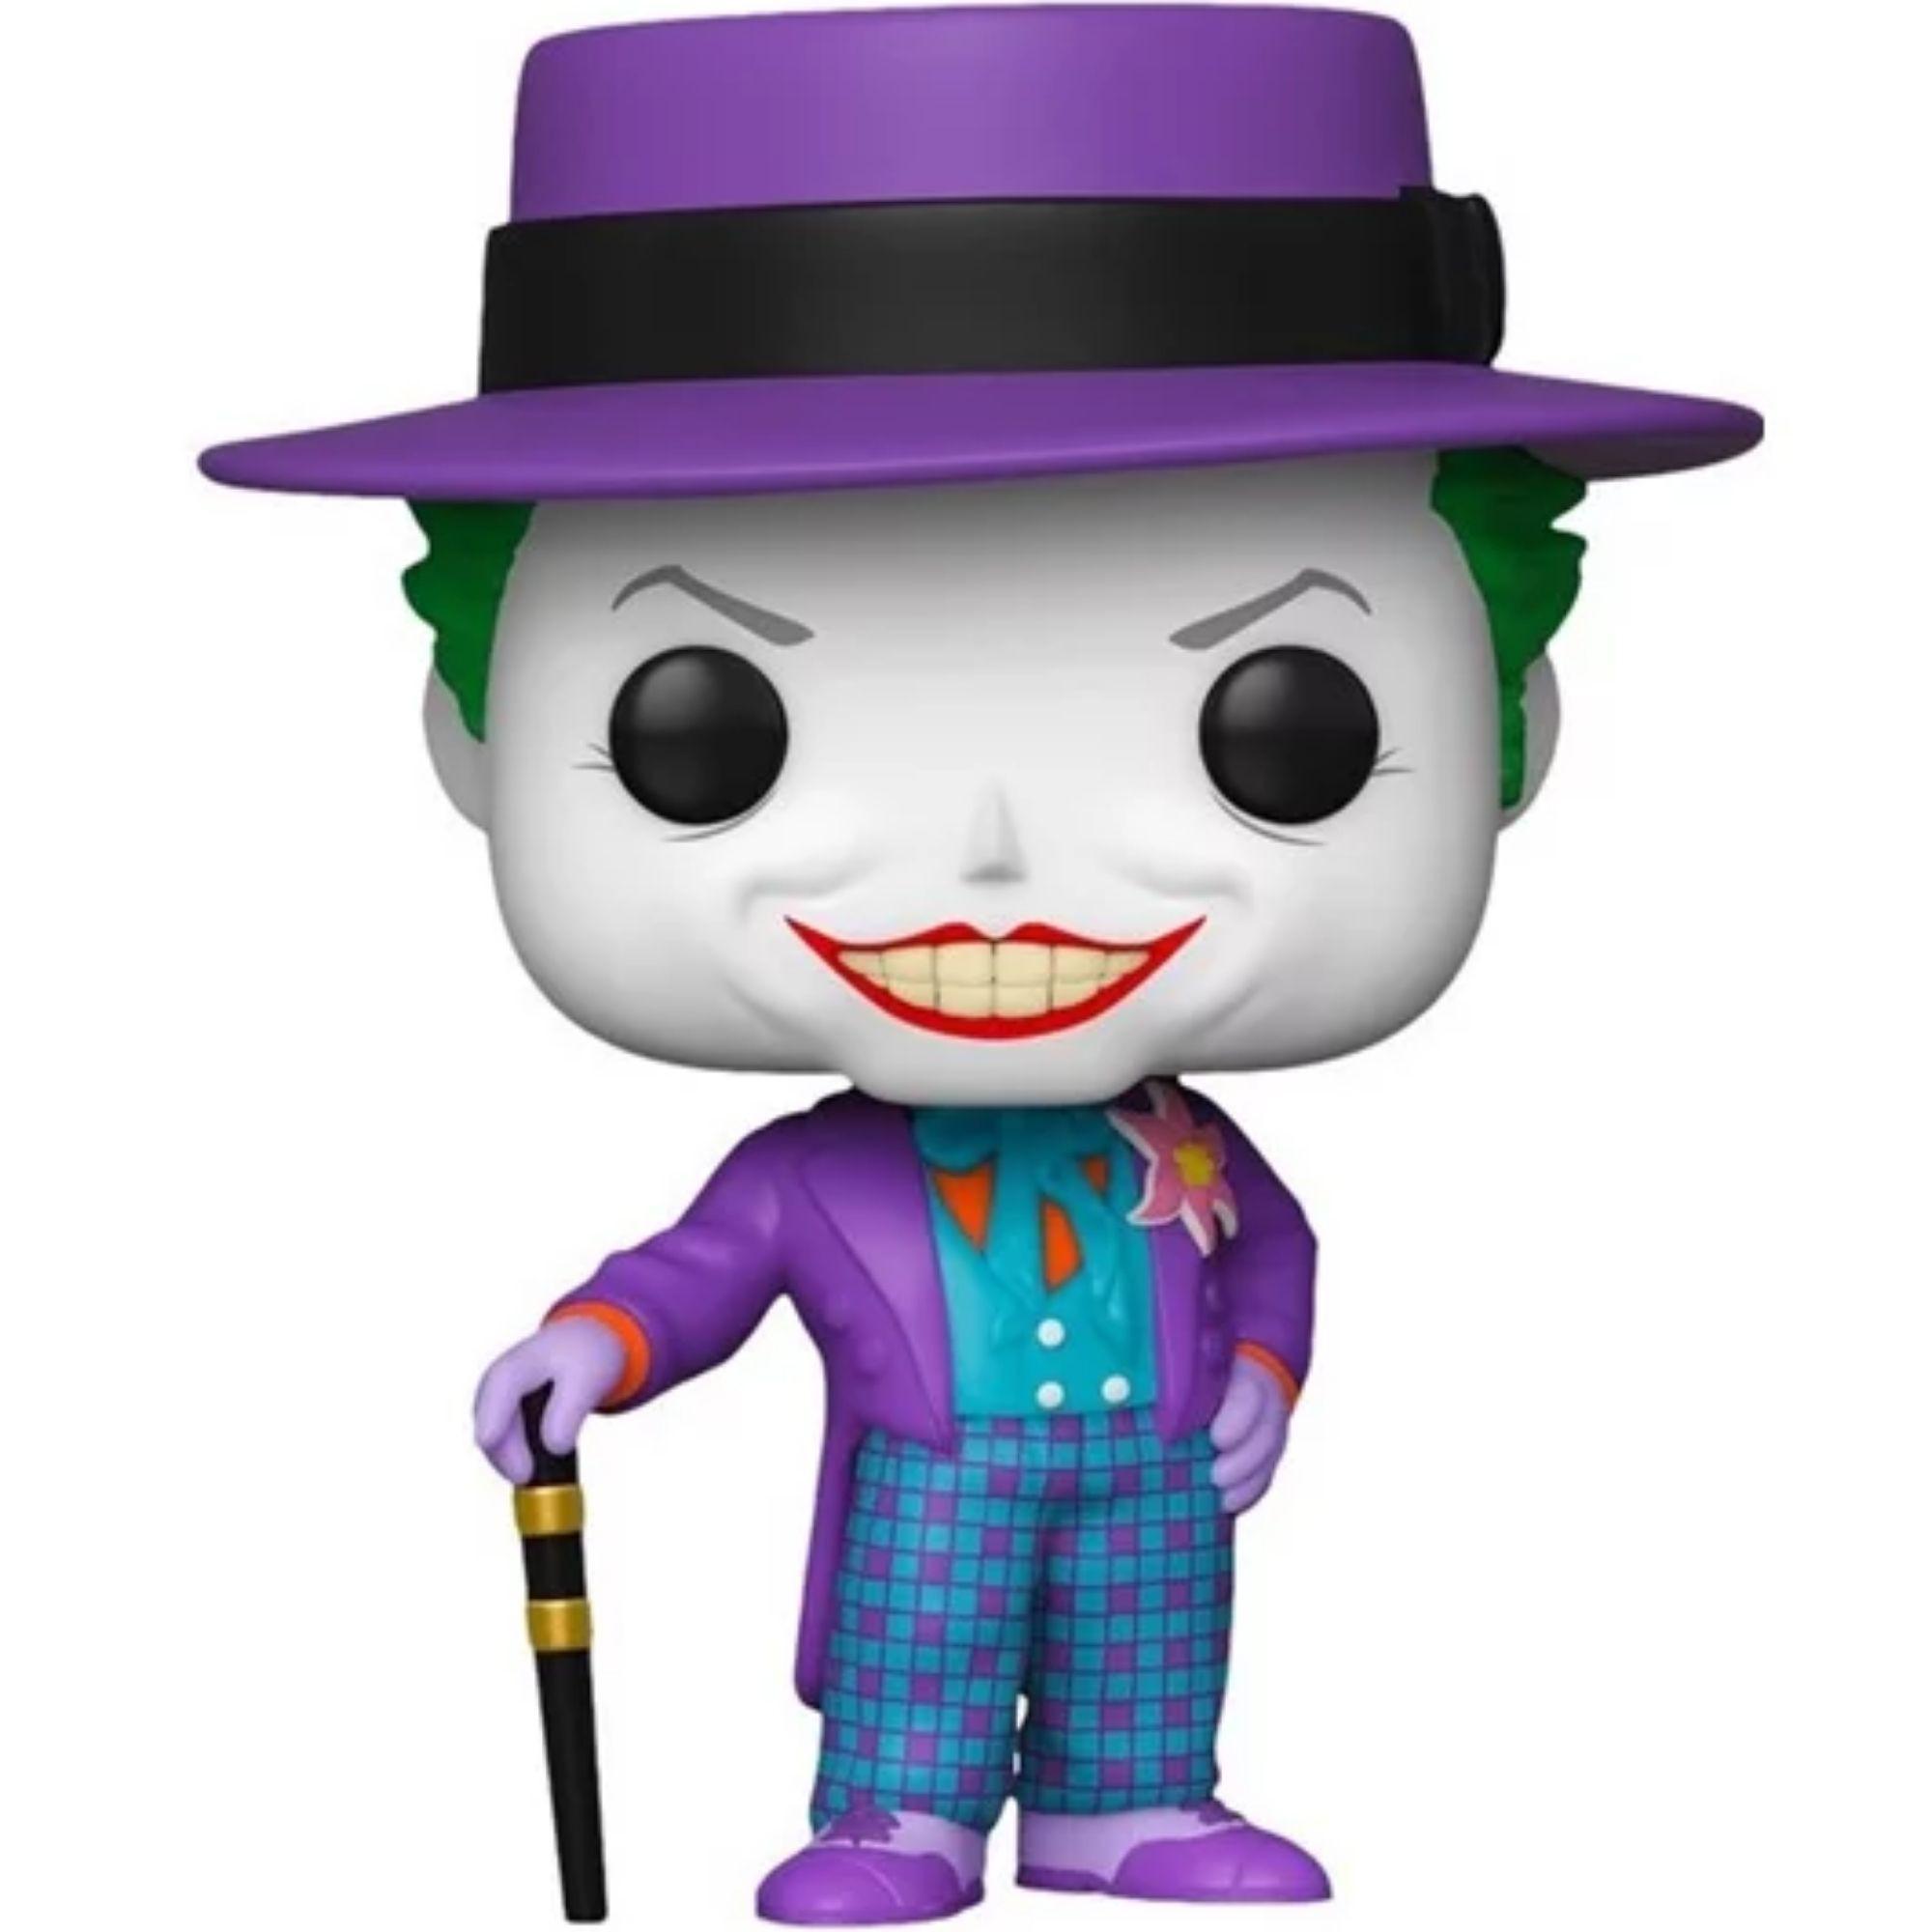 Boneco Funko Pop Batman Coringa The Joker 1989 #337  - Game Land Brinquedos